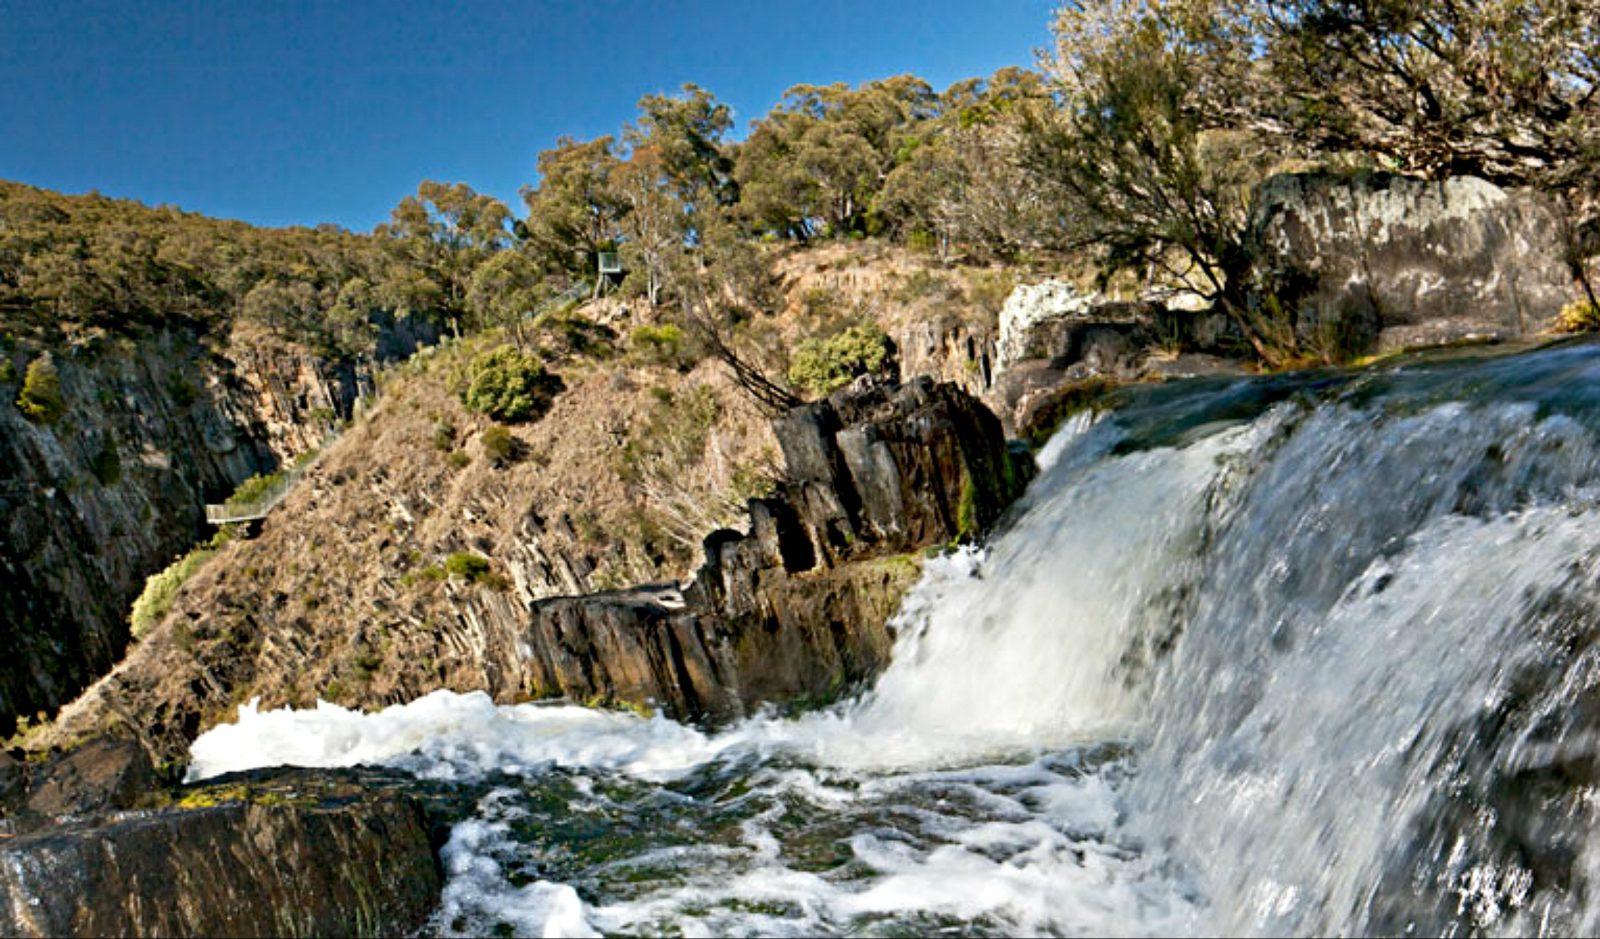 Oxley walk, Oxley Wild Rivers National Park. Photo: Gerhard Koertner